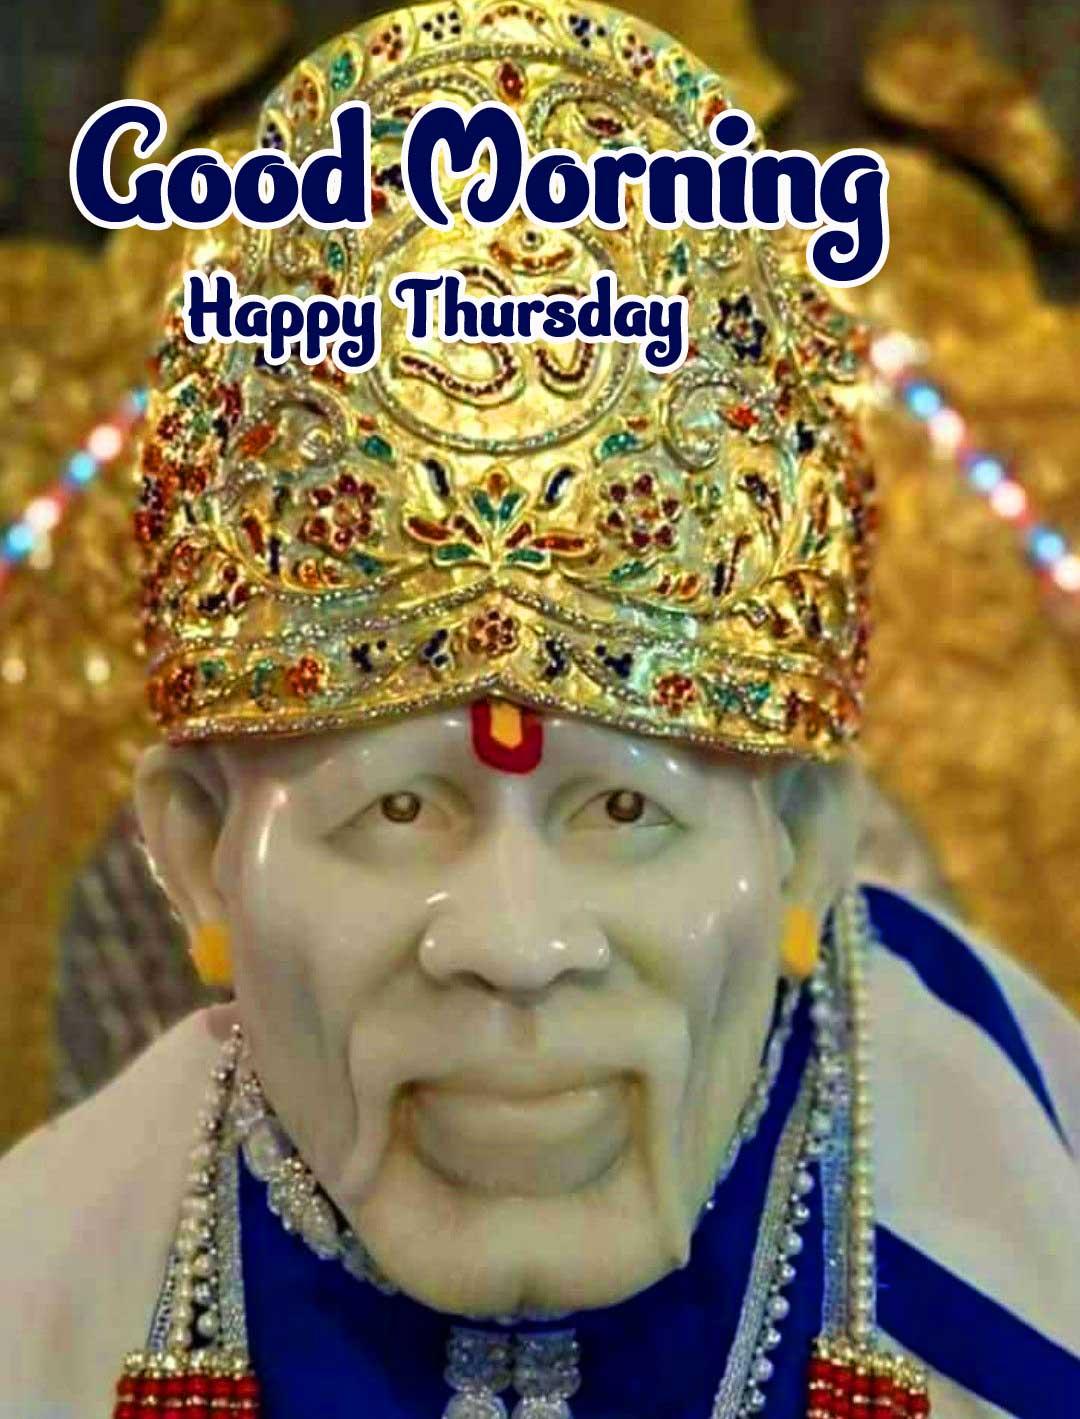 Thursday Good Morning Images Pics Wallpaper With Lord Sai Baba